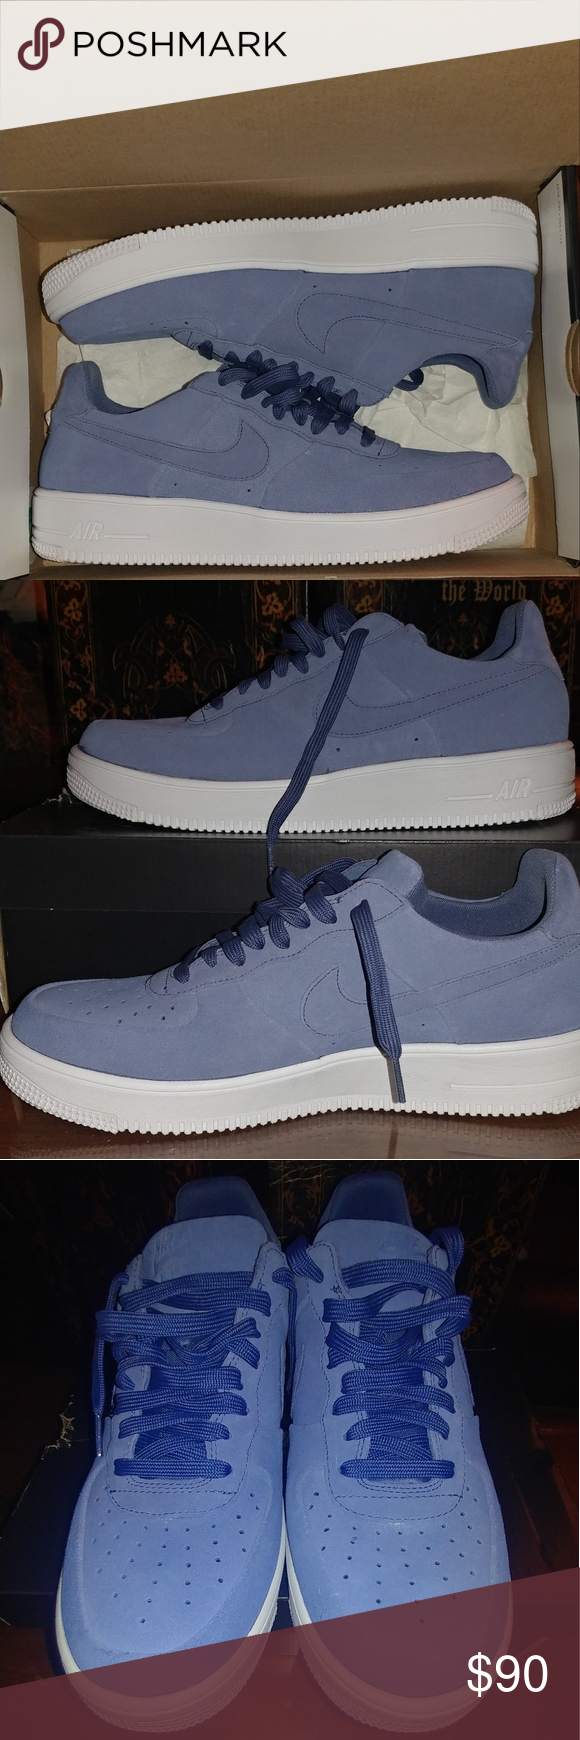 Air Force 1 Ultraforce Blue Moon Men's 11 NIB Men's Nike